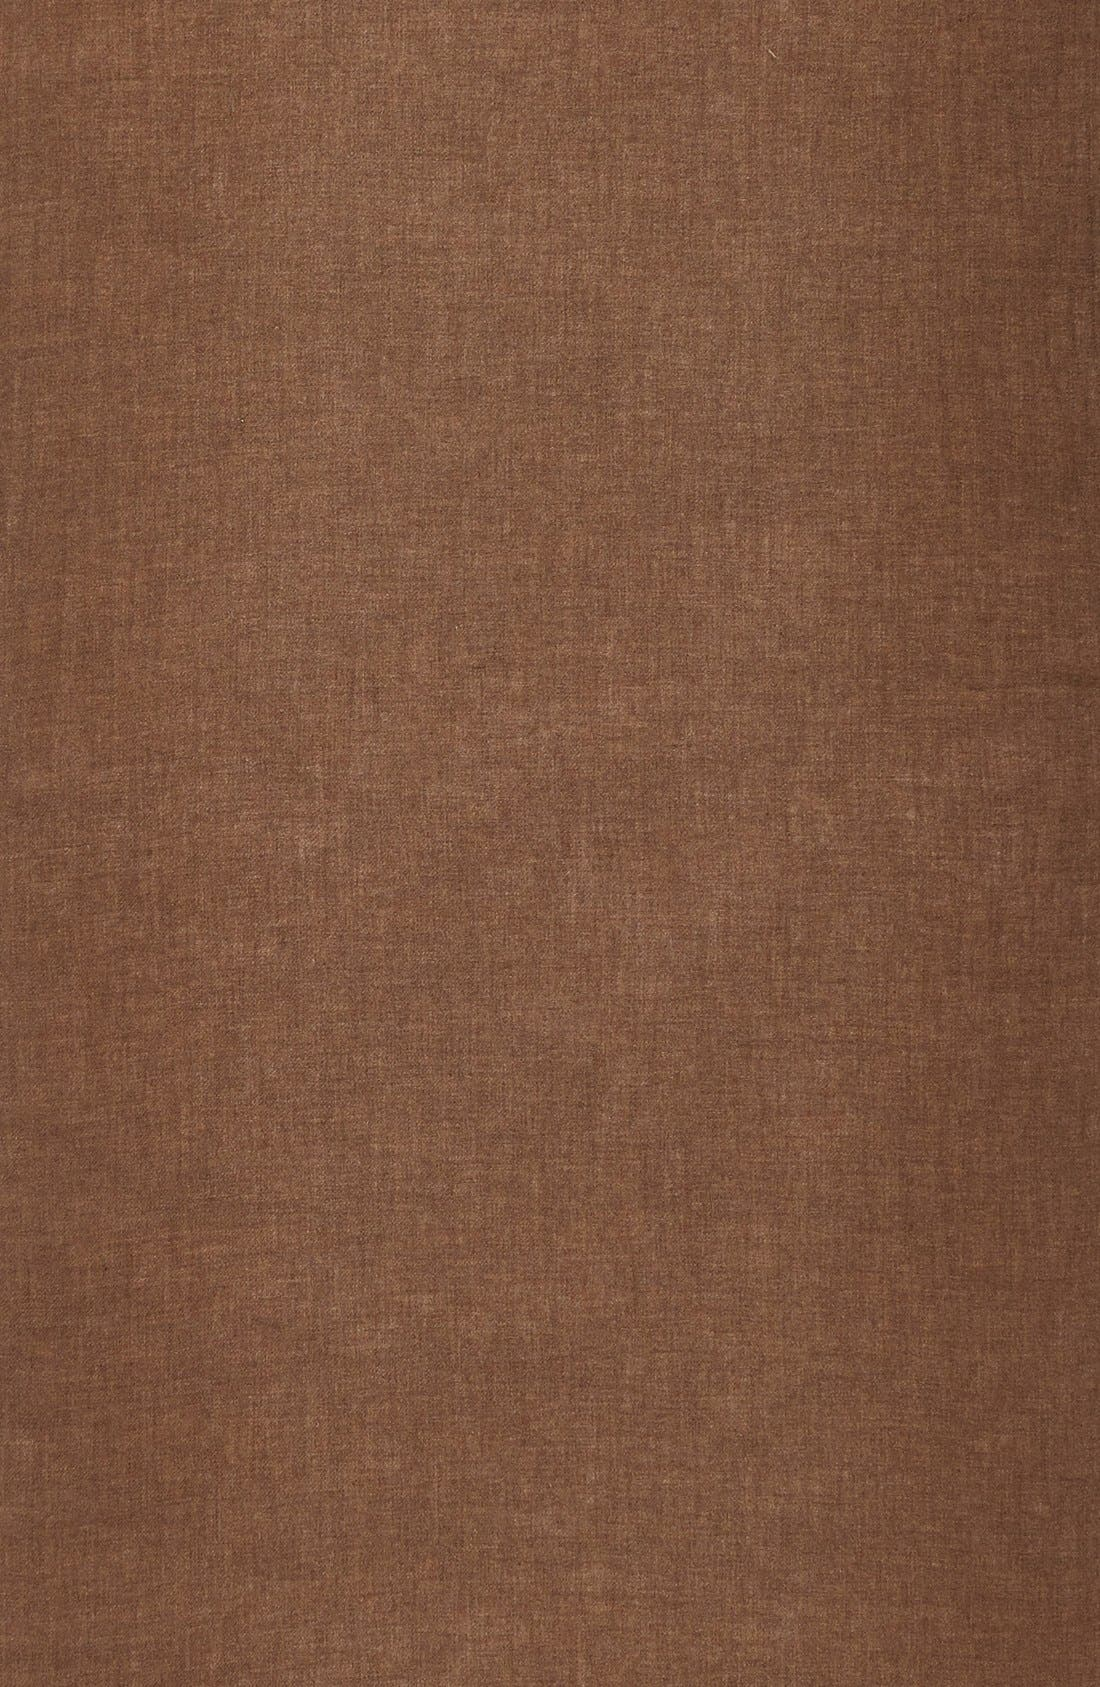 Wool & Cashmere Wrap,                             Alternate thumbnail 46, color,